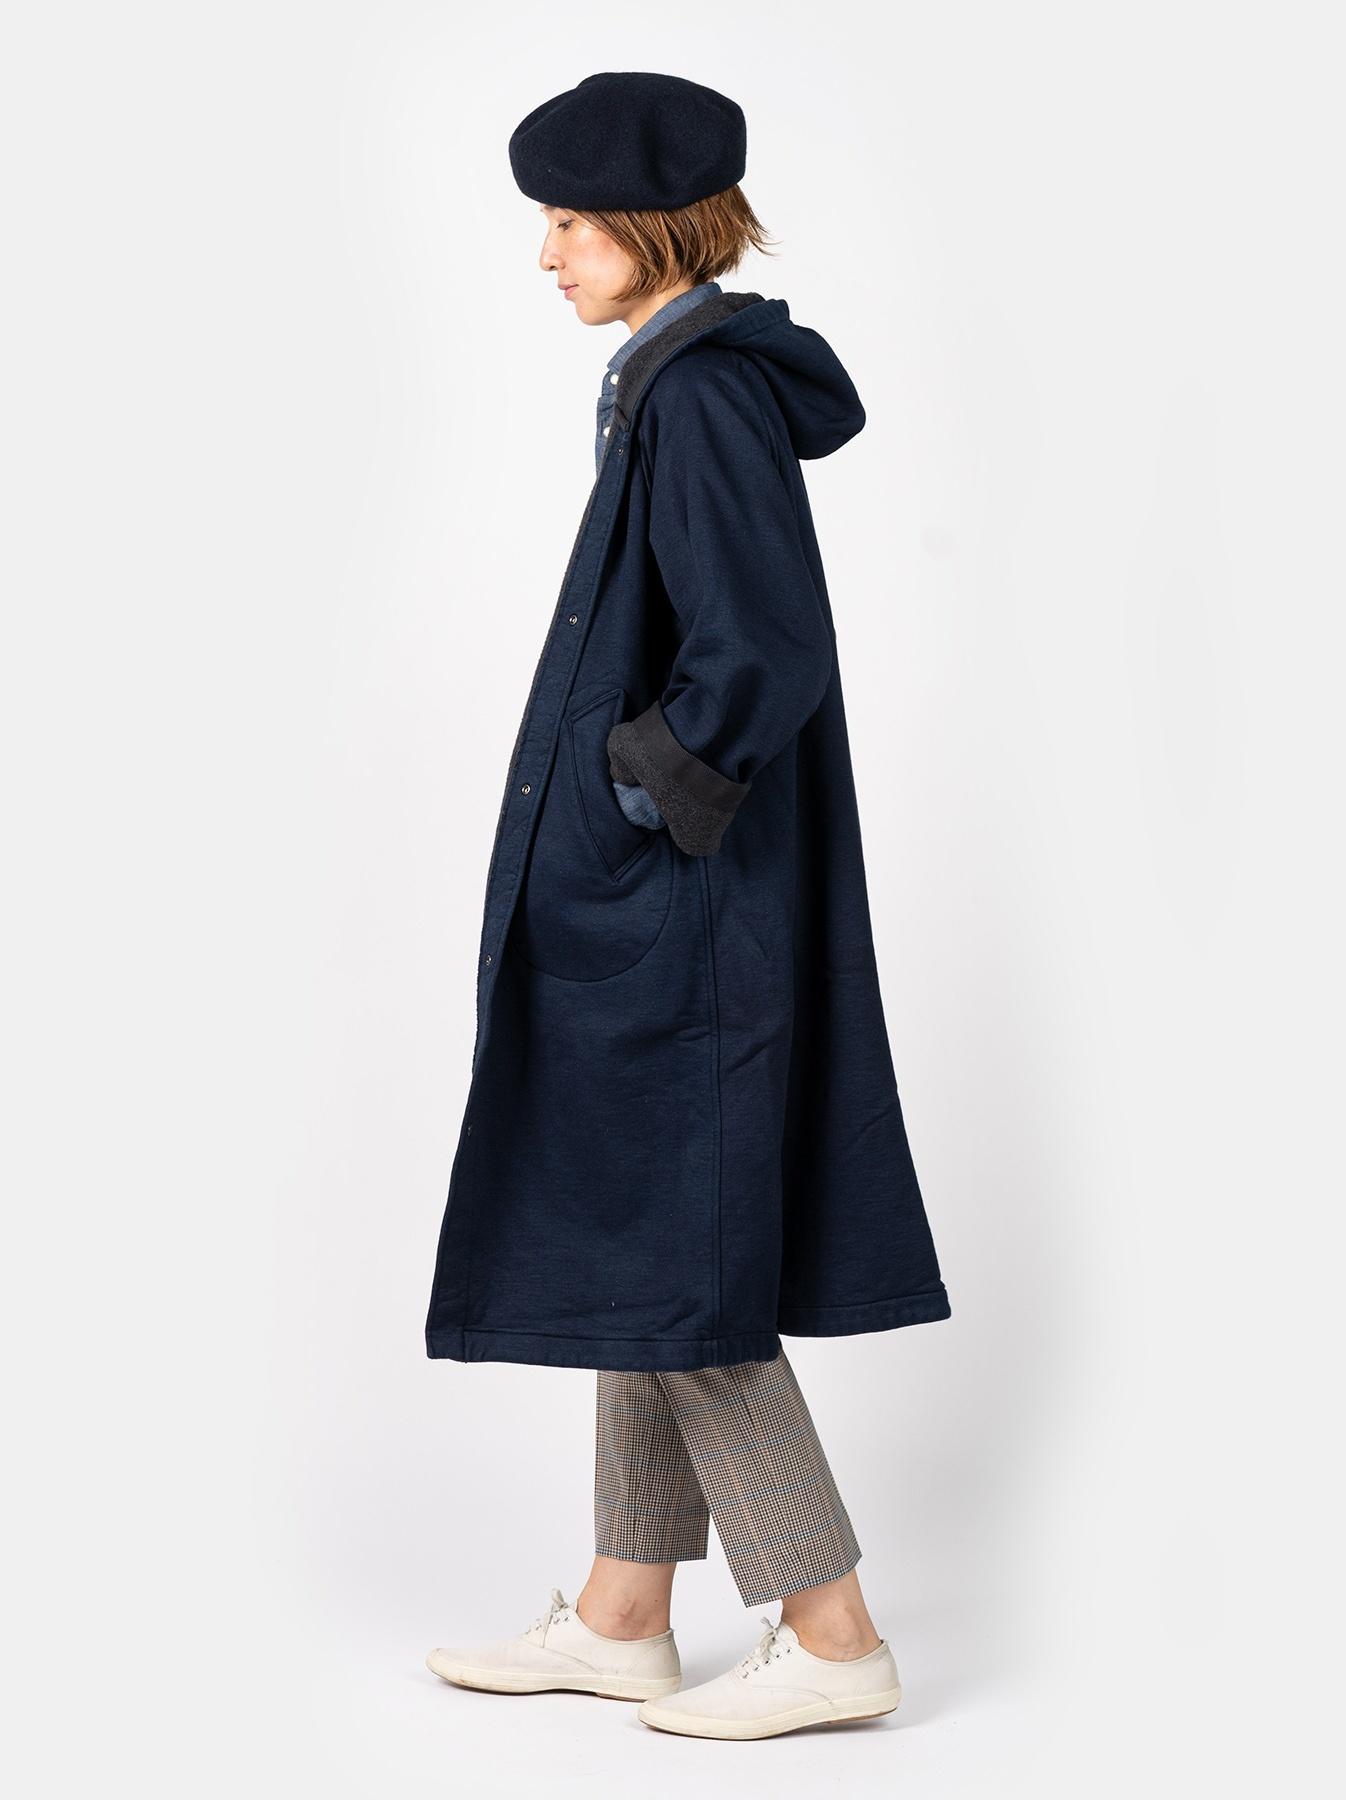 WH Indigo Mouton Fleecy 908 Hoodie Coat-3